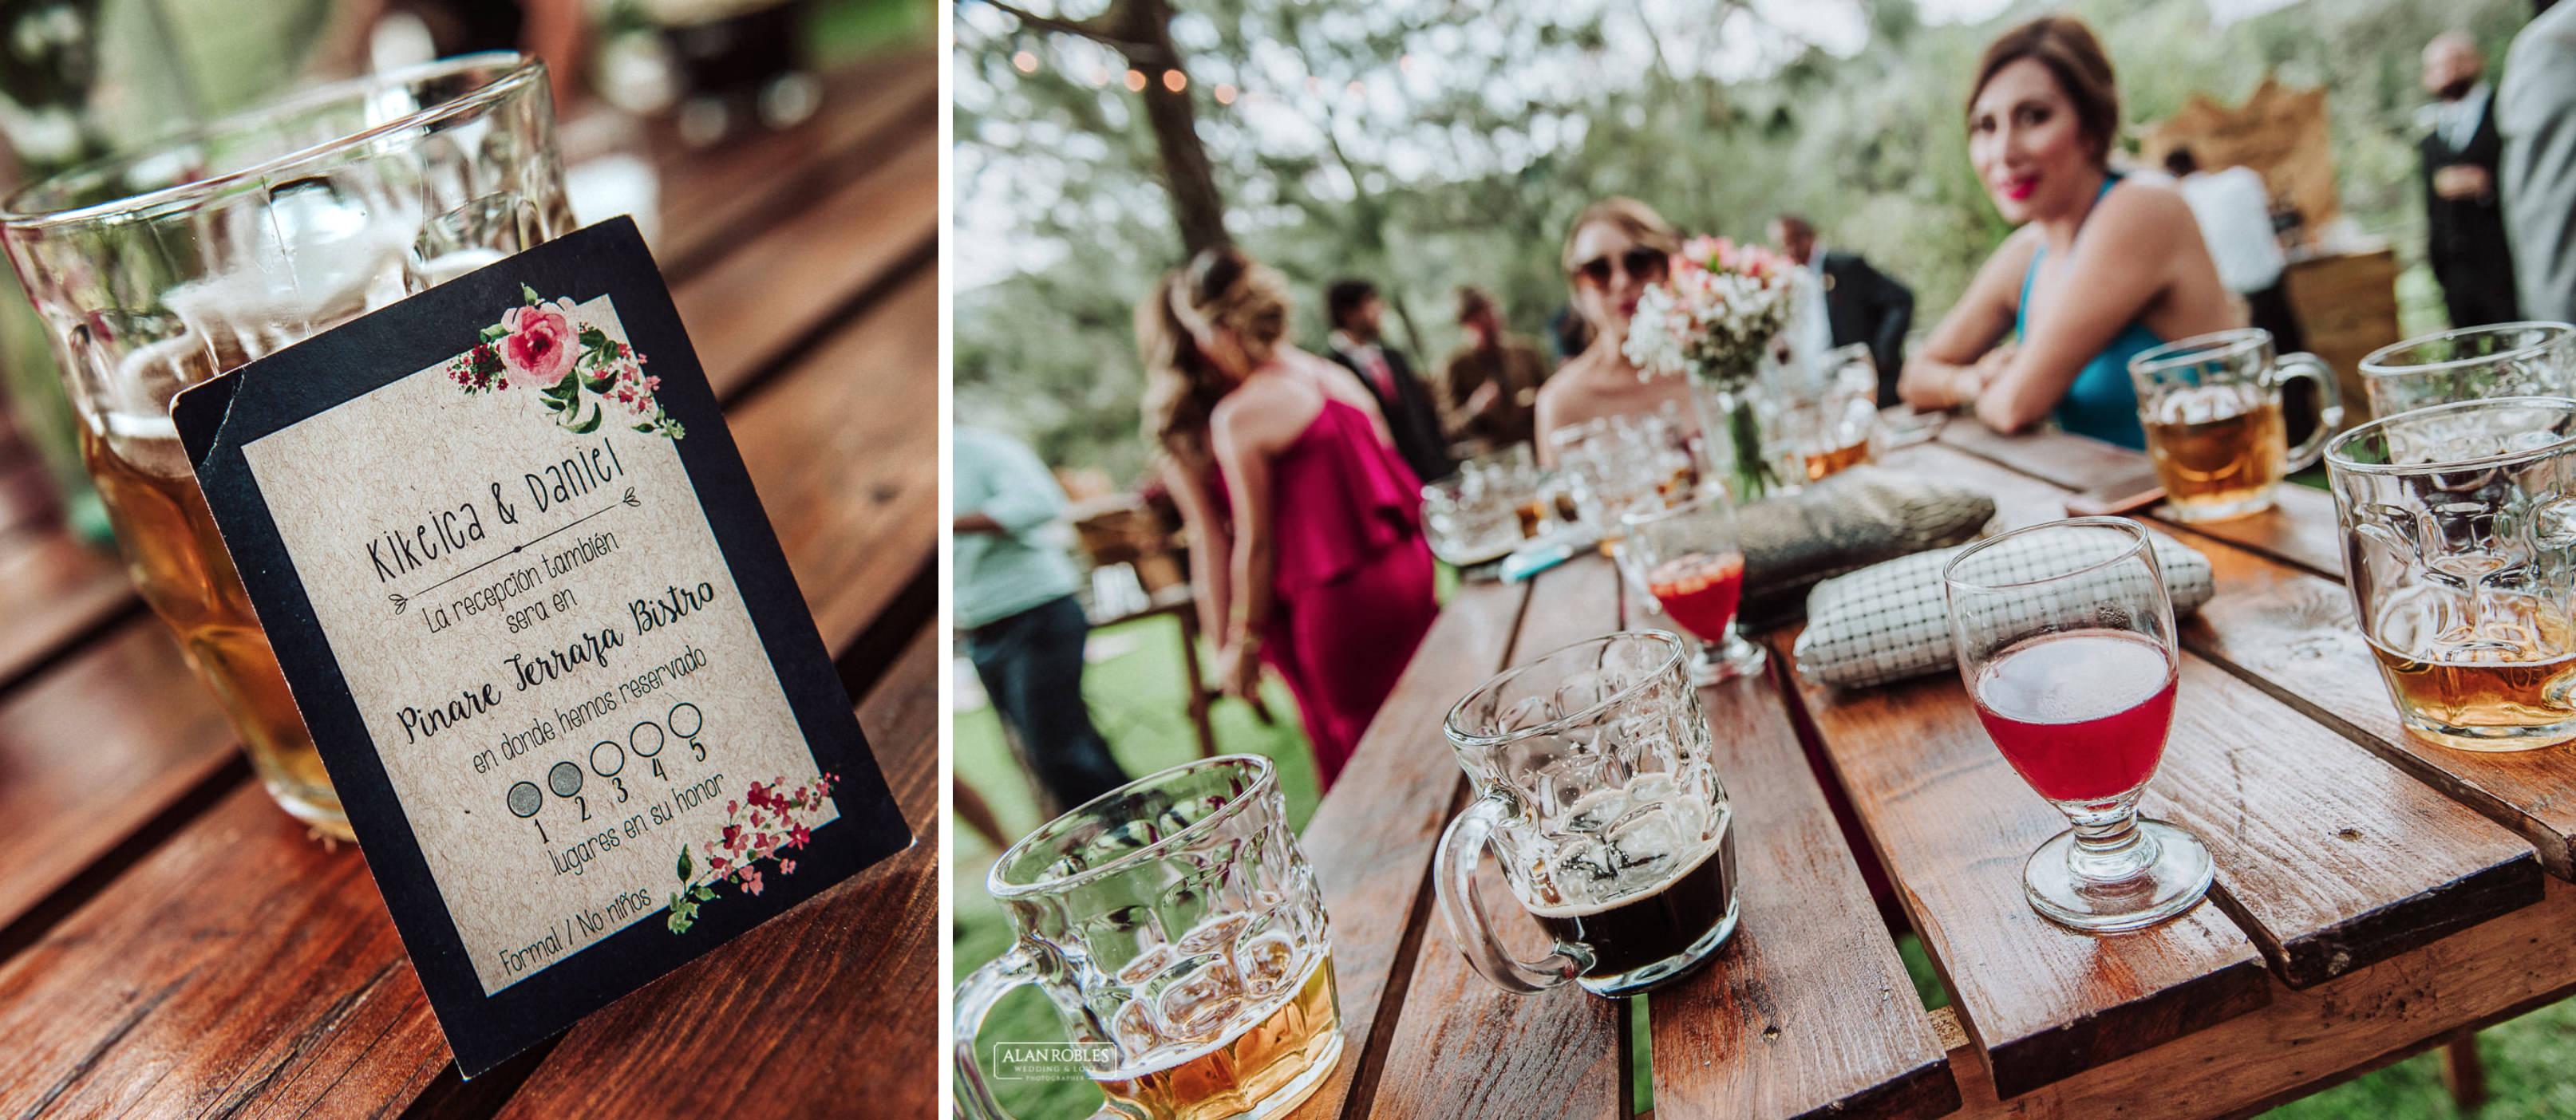 Fotografo de bodas guadalajara Alan Robles - Pinare terraza bistro 23